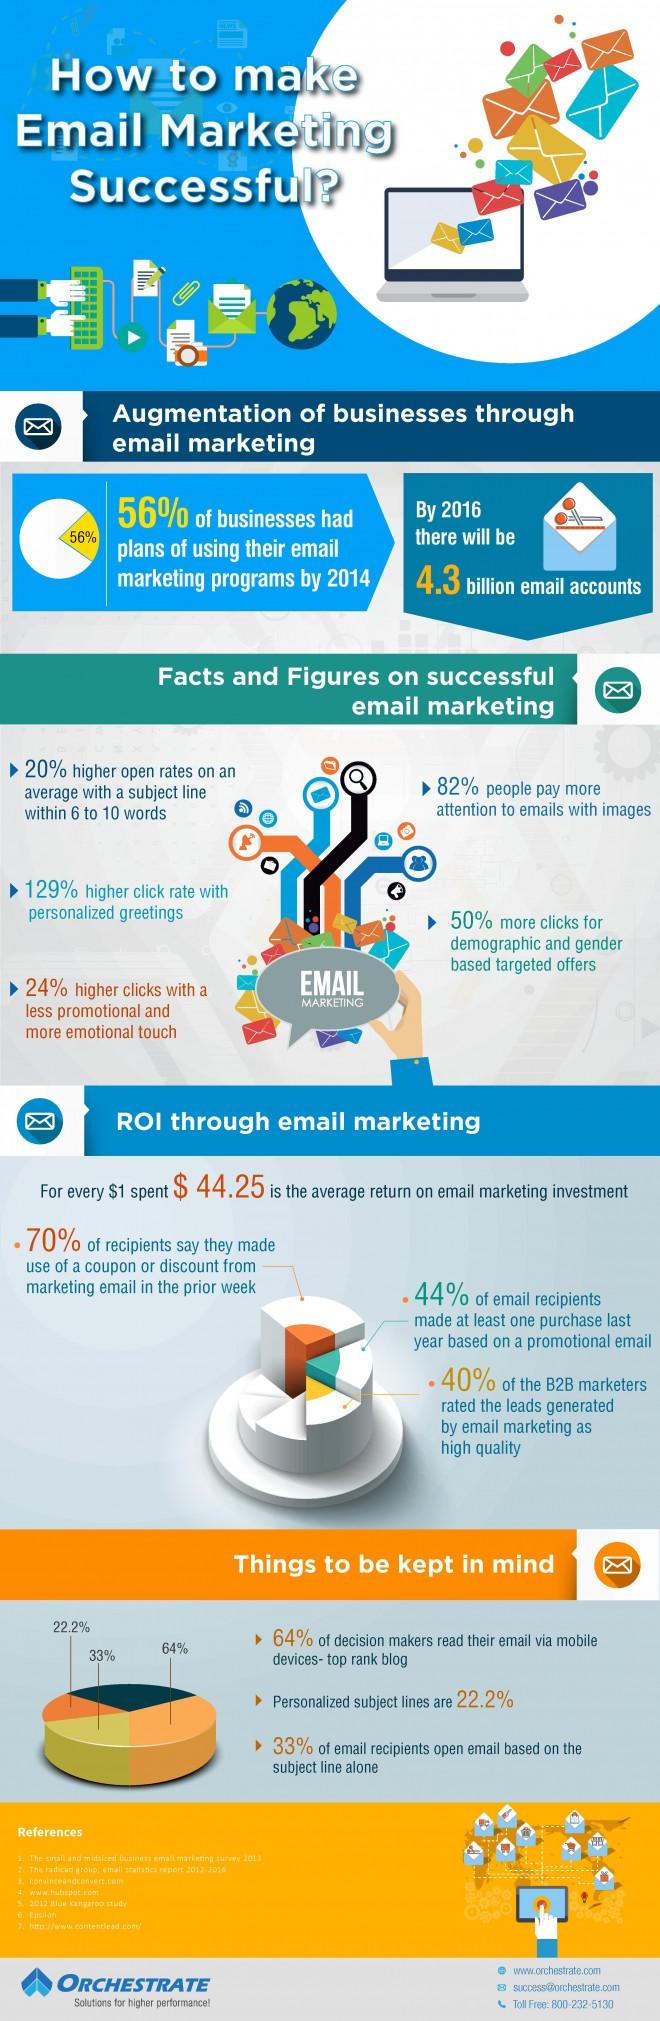 email marketing campaign essentials